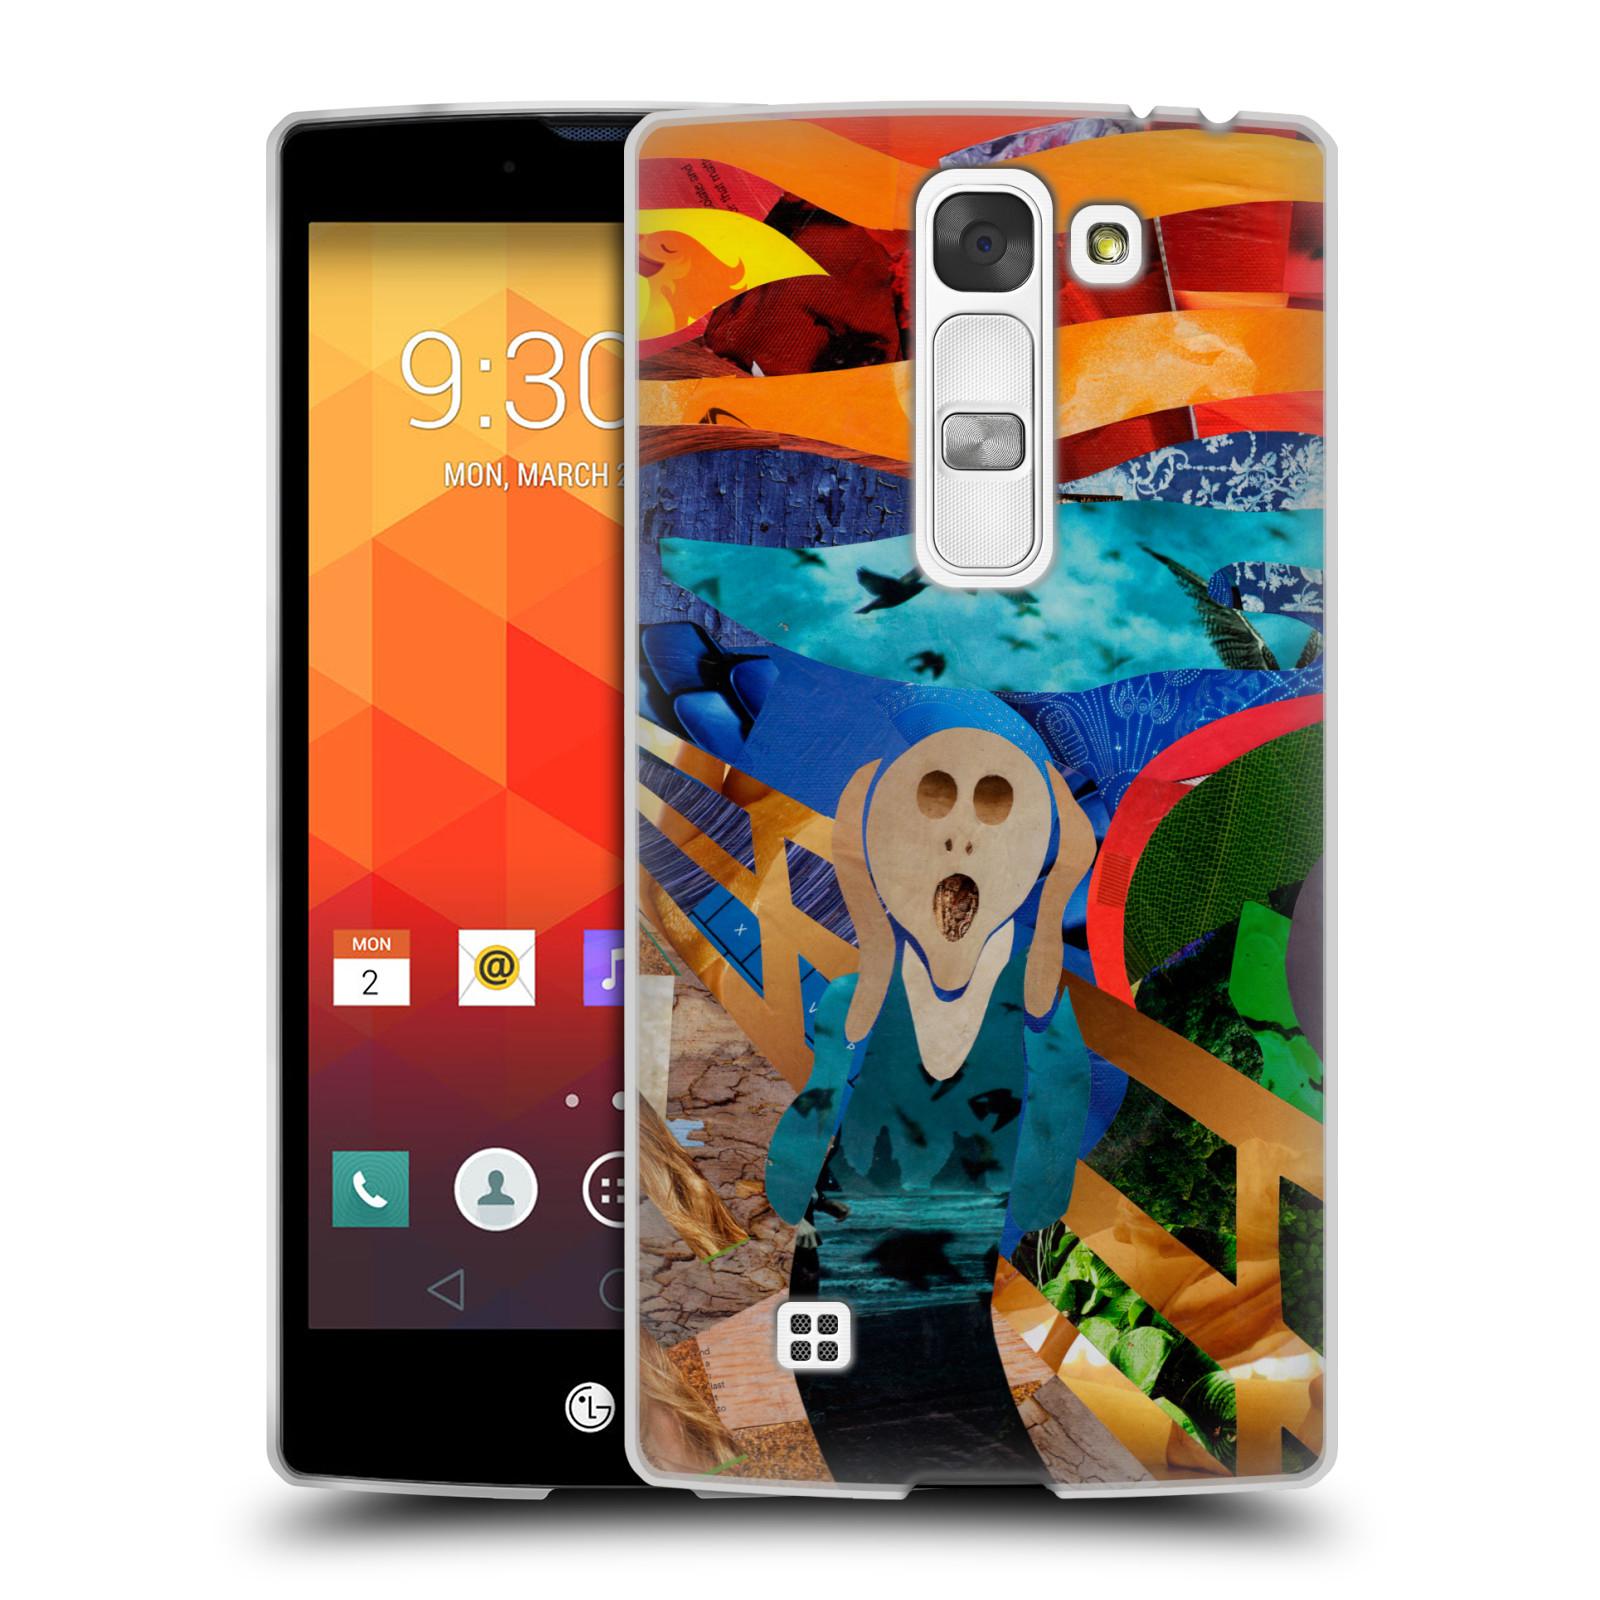 Case Of Squishy Pops : OFFICIAL ARTPOPTART POP CULTURE SOFT GEL CASE FOR LG PHONES 2 eBay